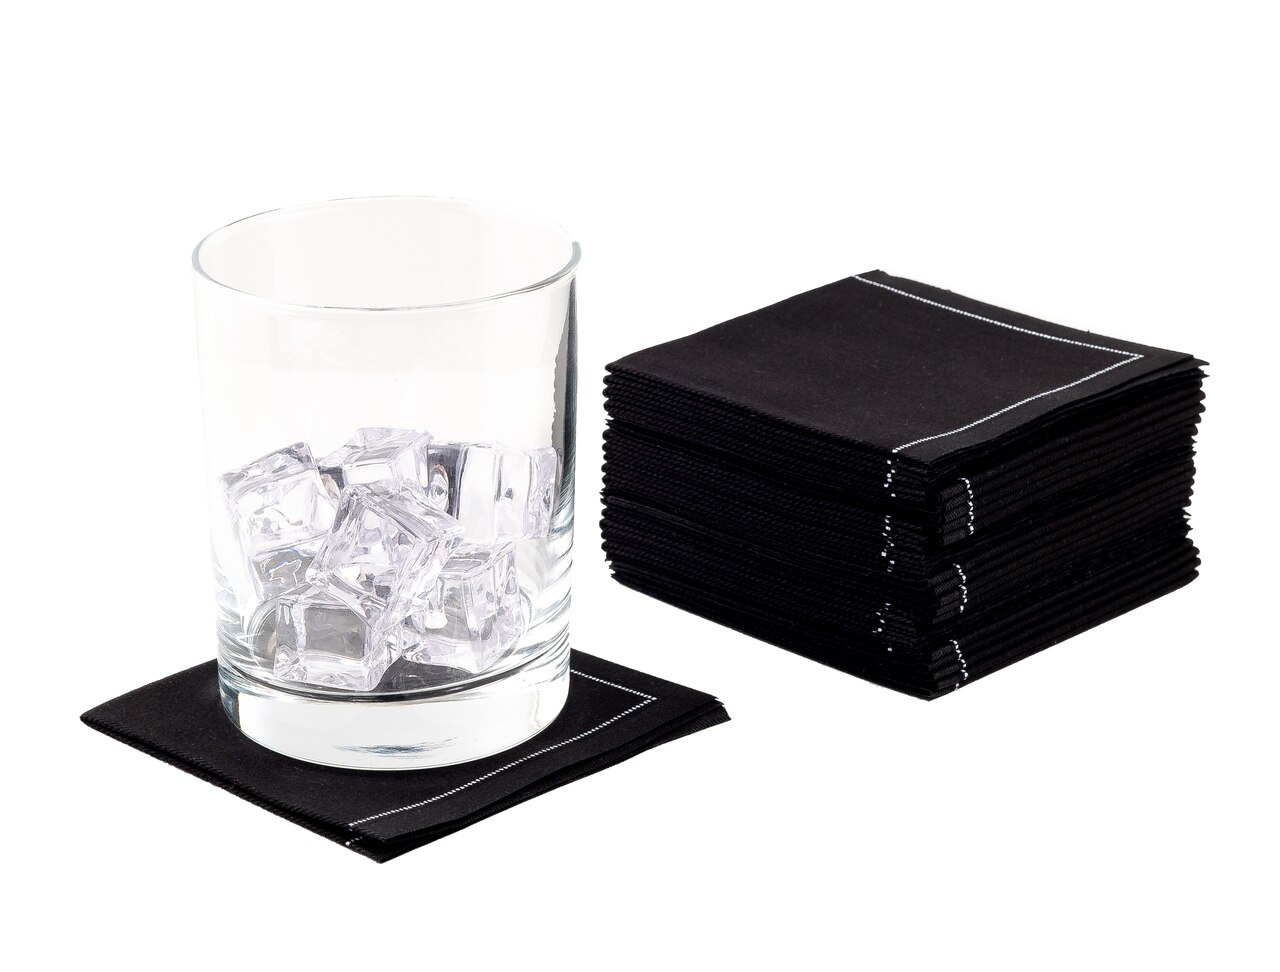 "Black Cotton 1/4 Fold Cocktail Premium - 8"" x 8"" (folded 4"" x 4"") - 30 units"